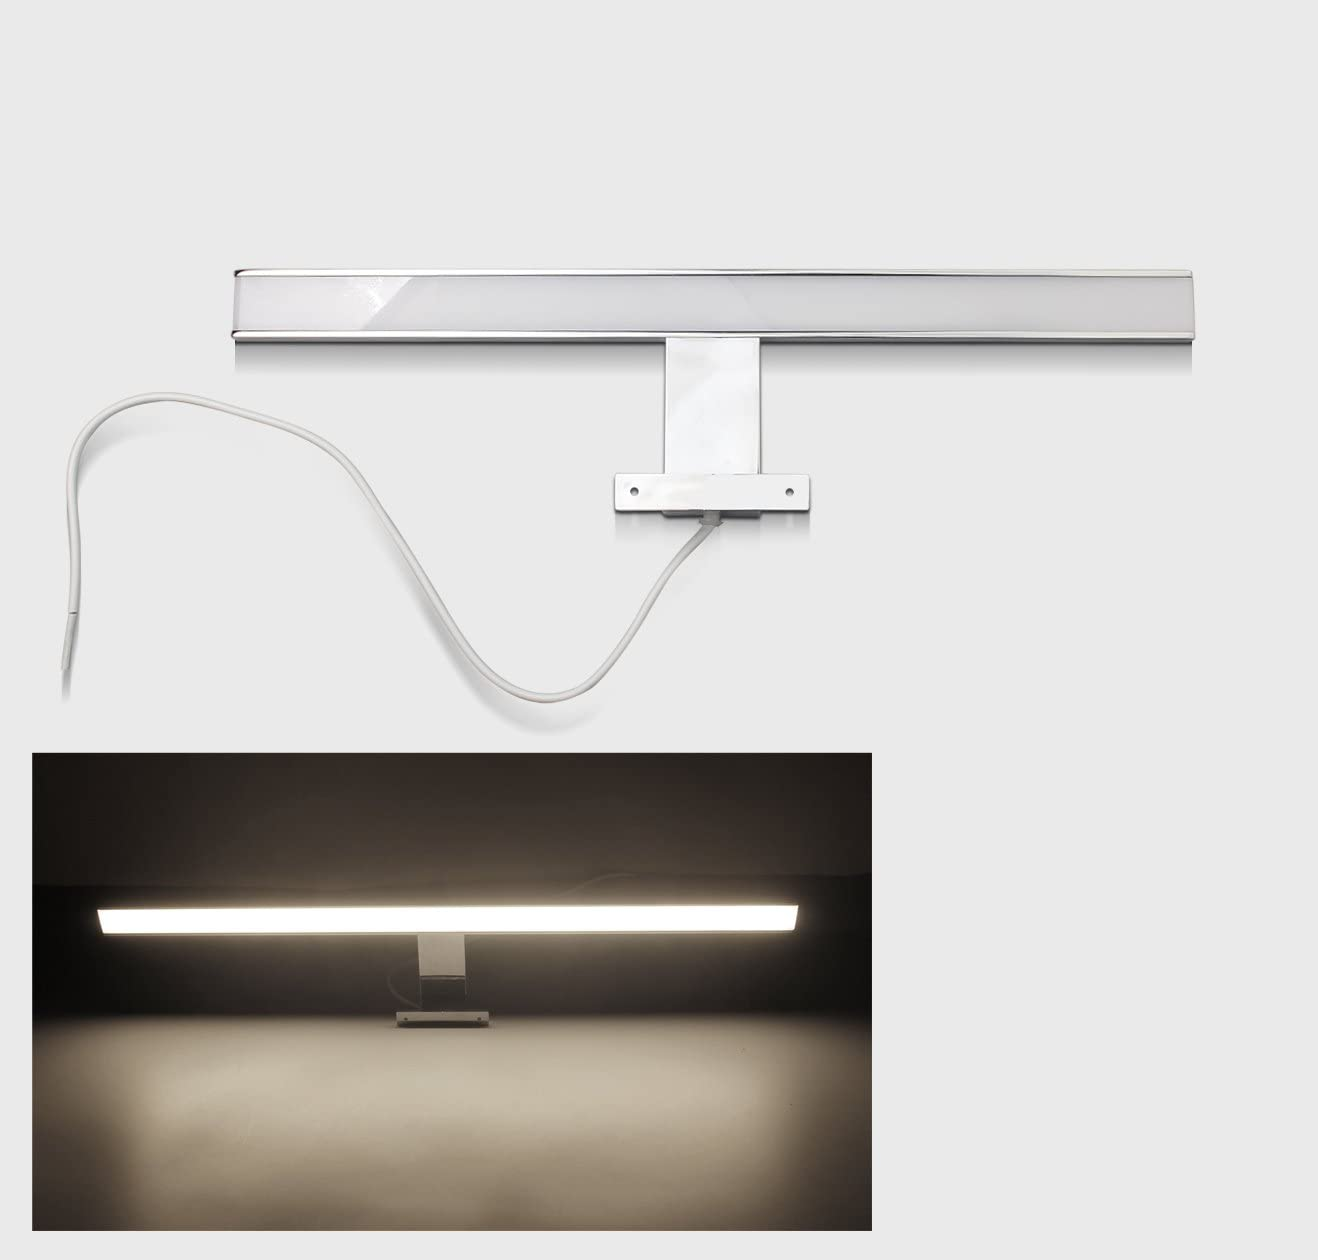 /L/ámpara LED de ba/ño espejo l/ámpara de 40//60//80/cm ba/ño Proyecci/ón Cromado Armario 40cm//6W Neutralwei/ß Top/